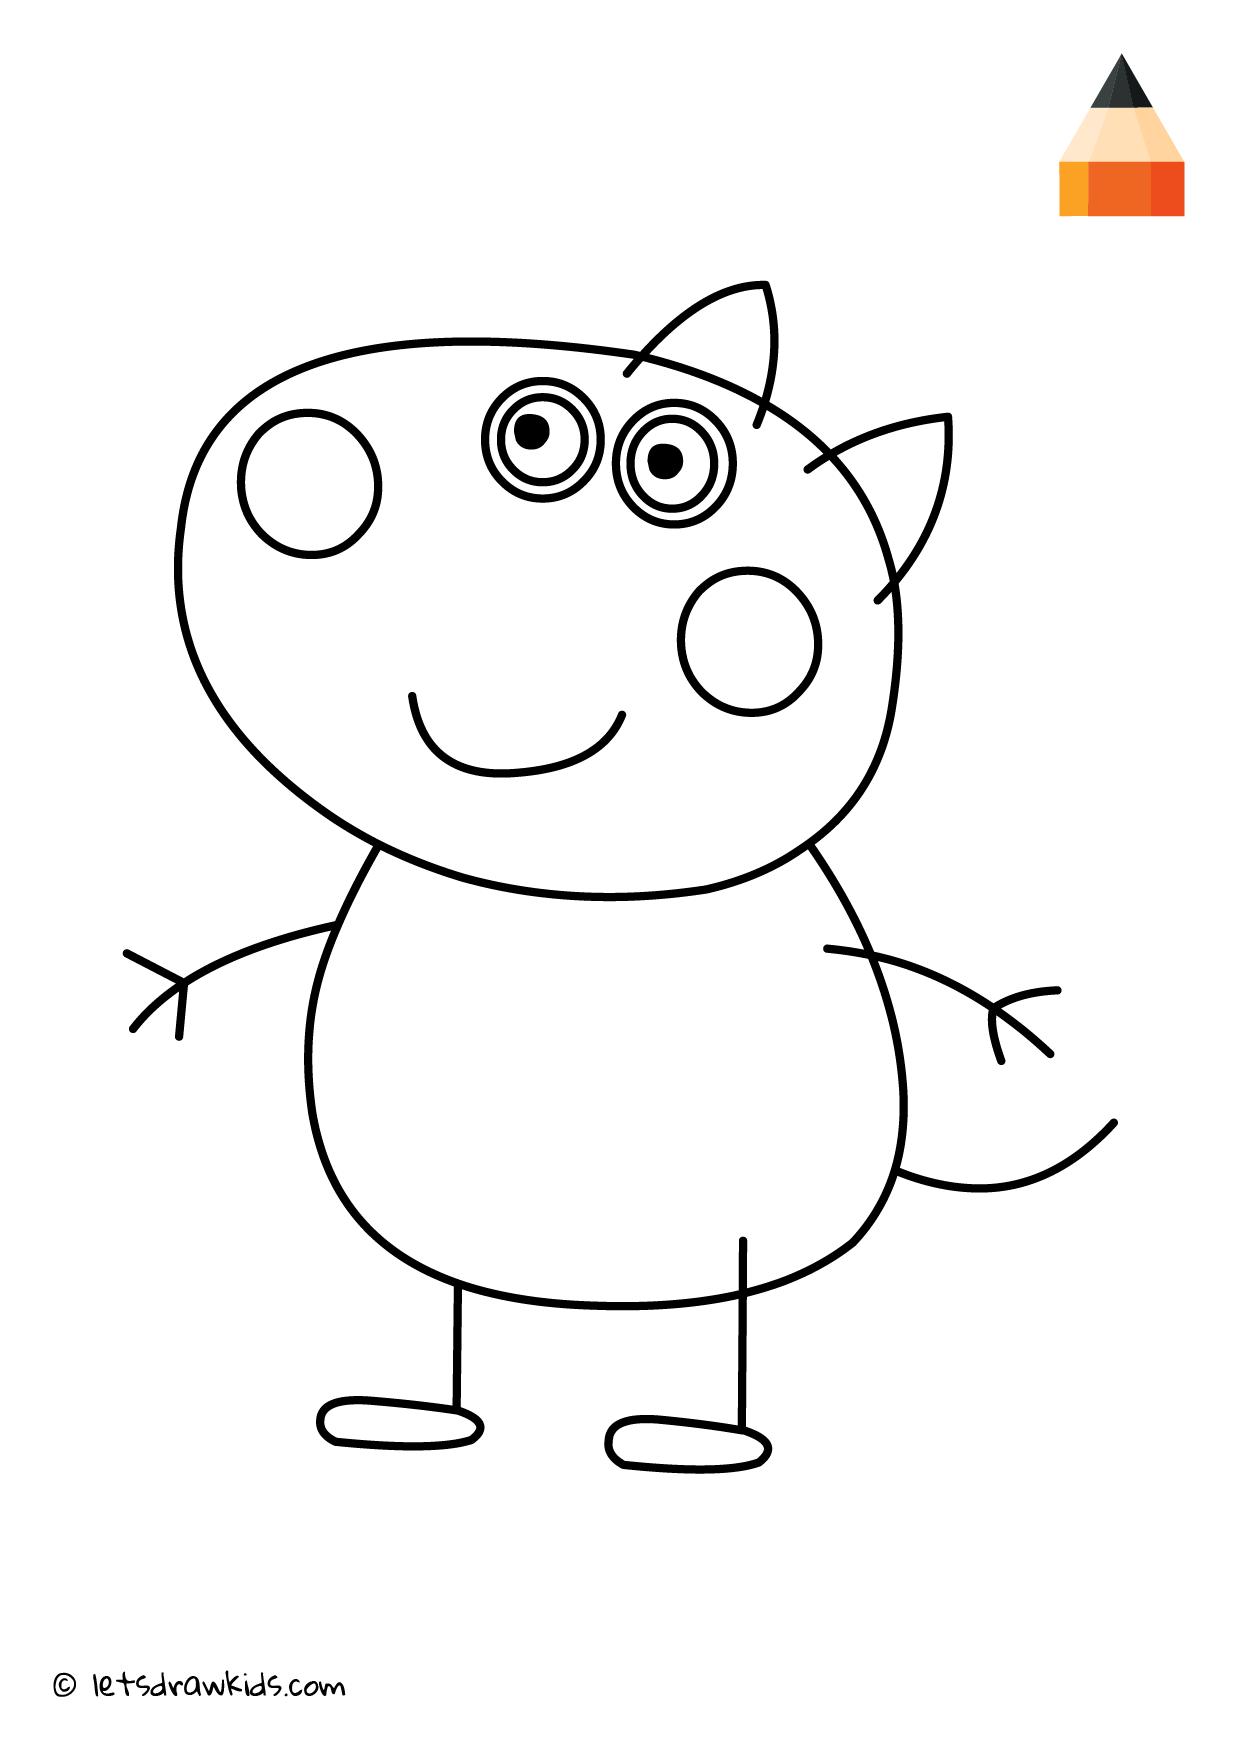 Coloring Page Peppa Pig Danny Dog Peppa Pig Coloring Pages Peppa Pig Painting Peppa Pig